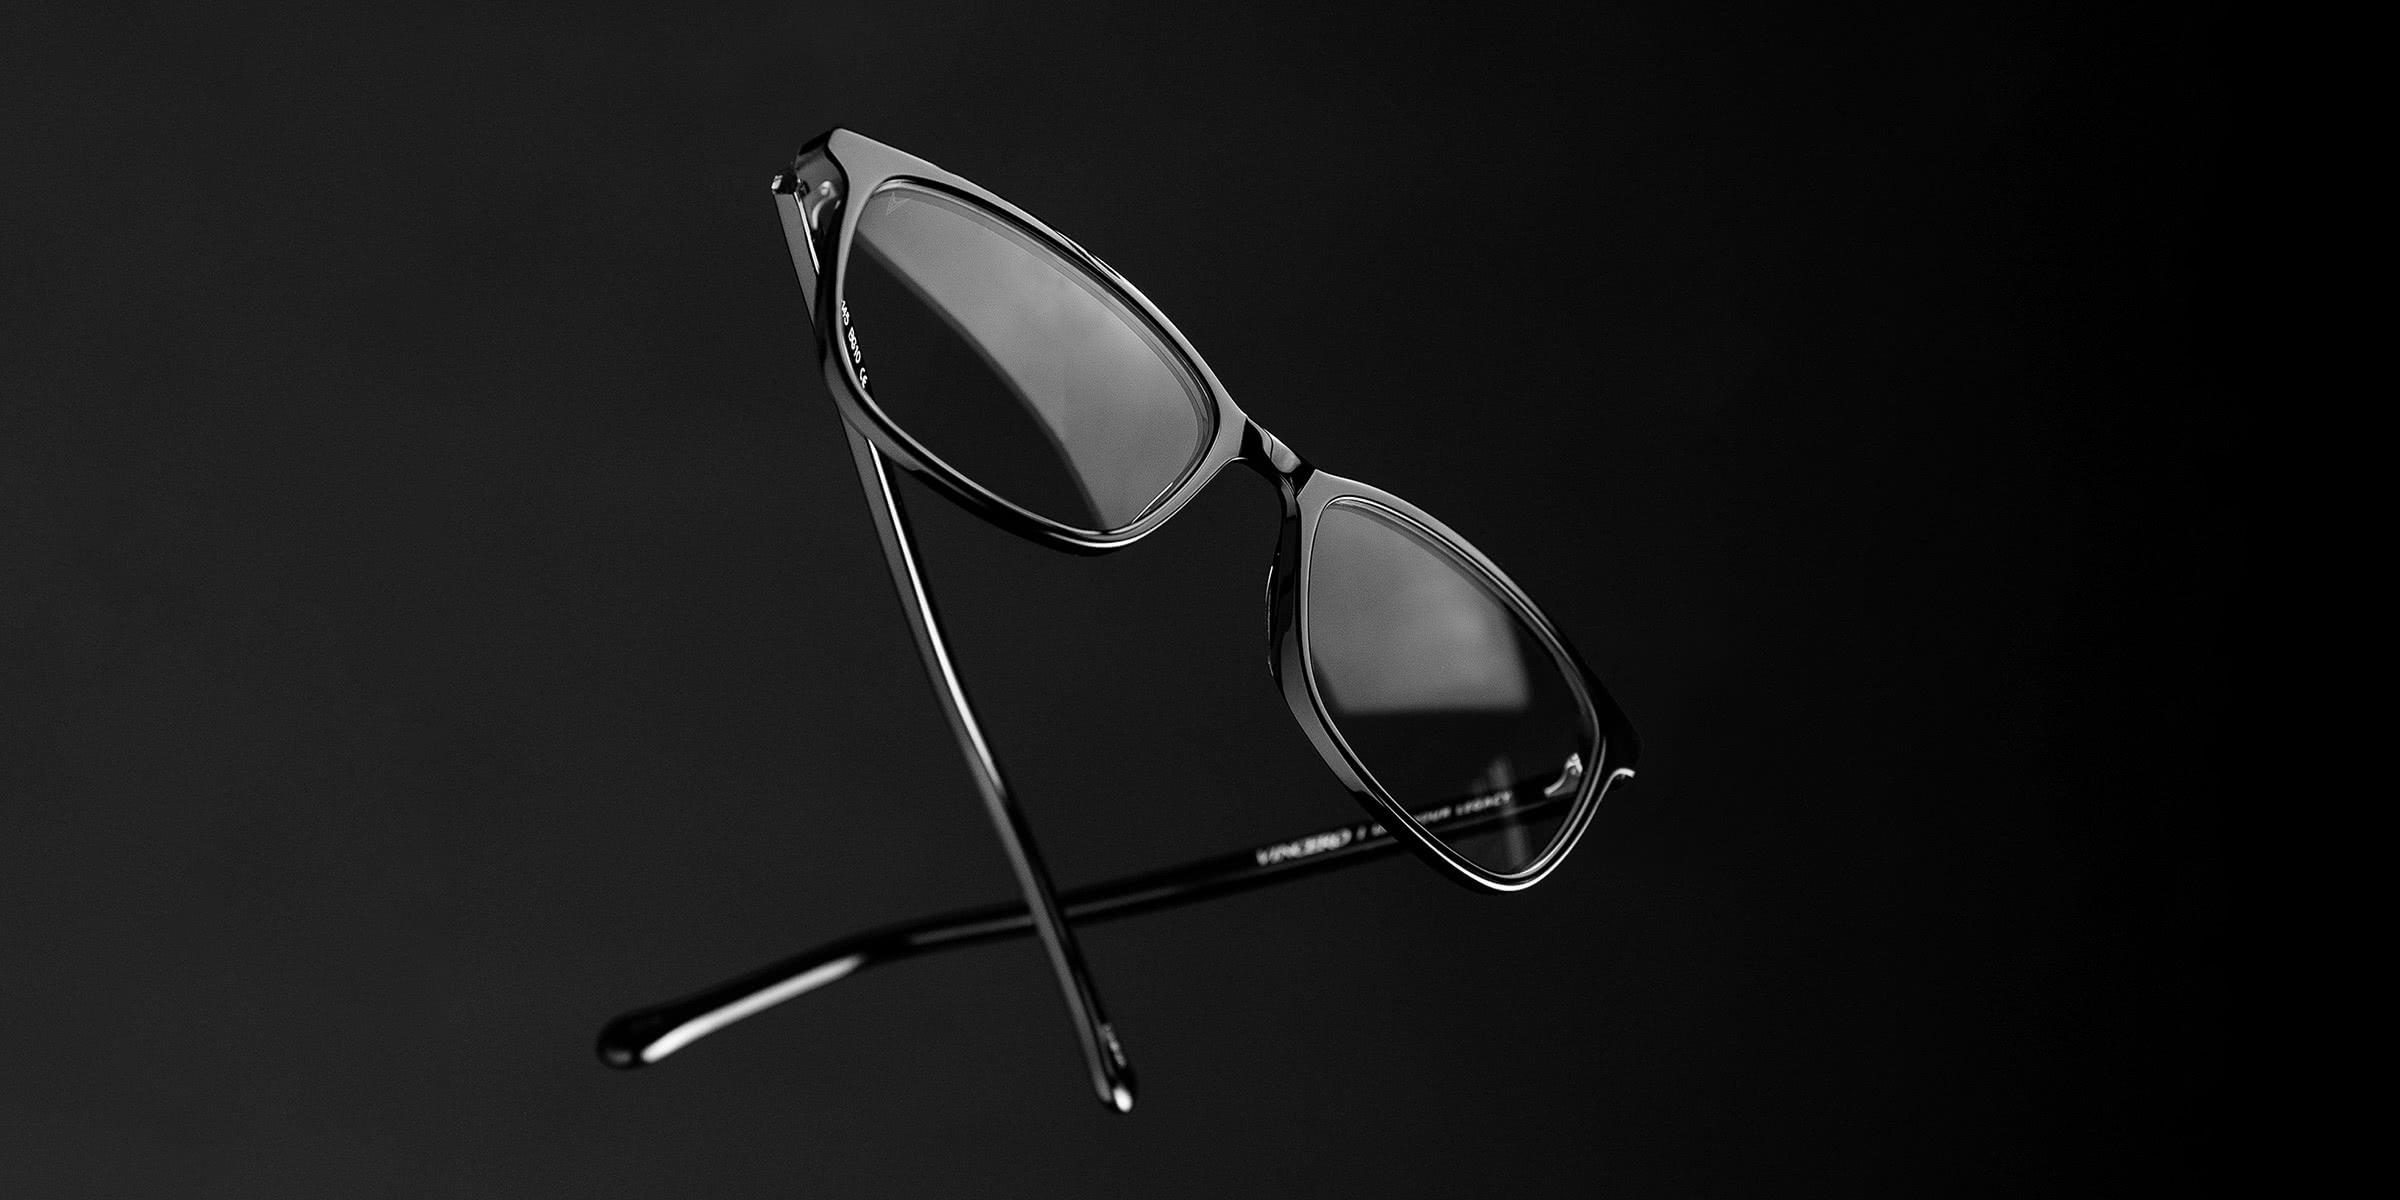 best blue light blocking glasses review - Luxe Digital